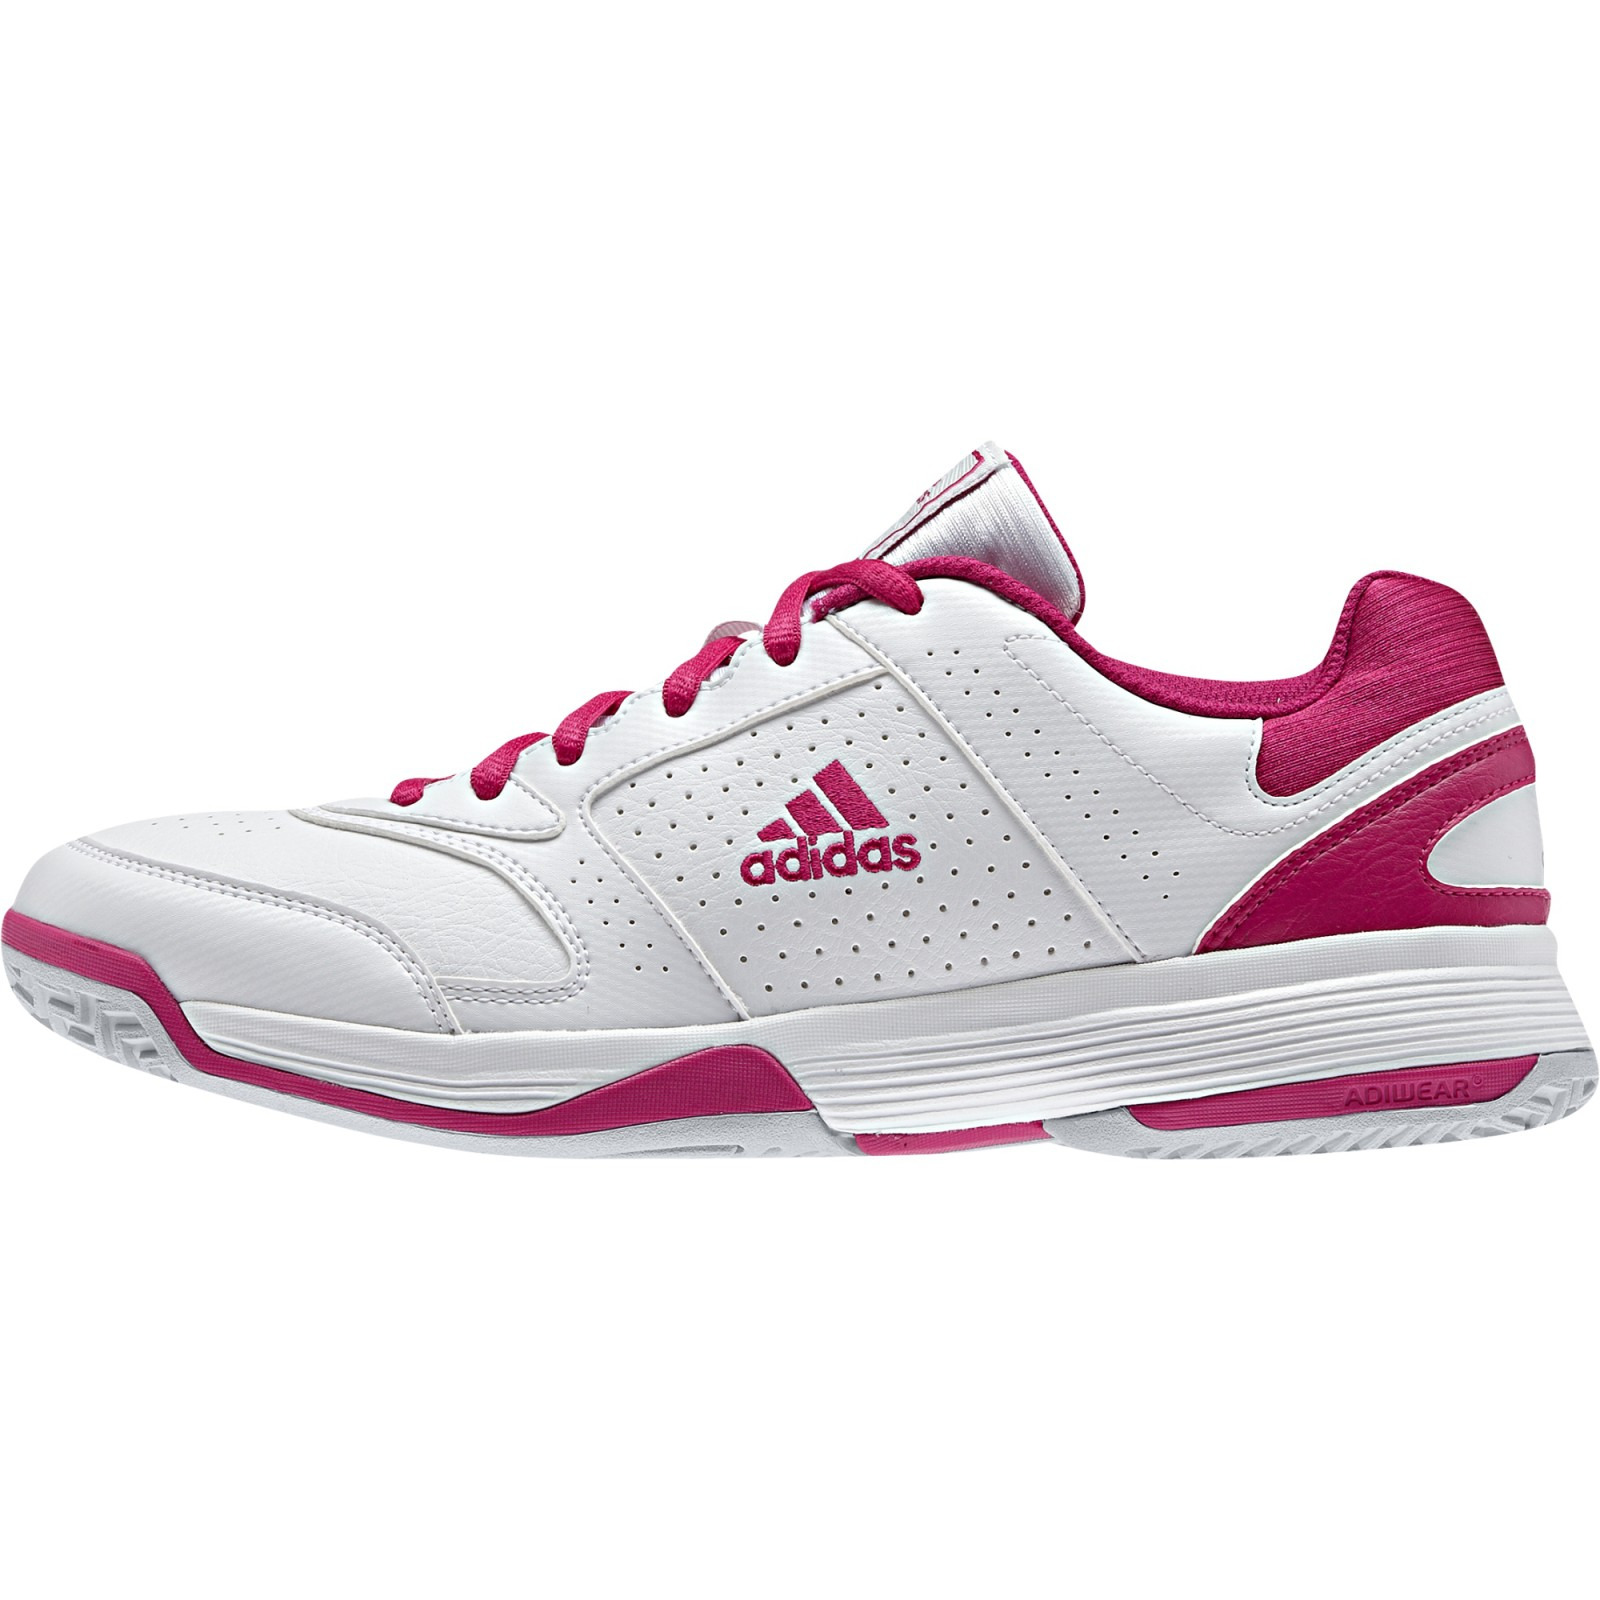 75a1dbda069 Dámské tenisové boty adidas Response aspire